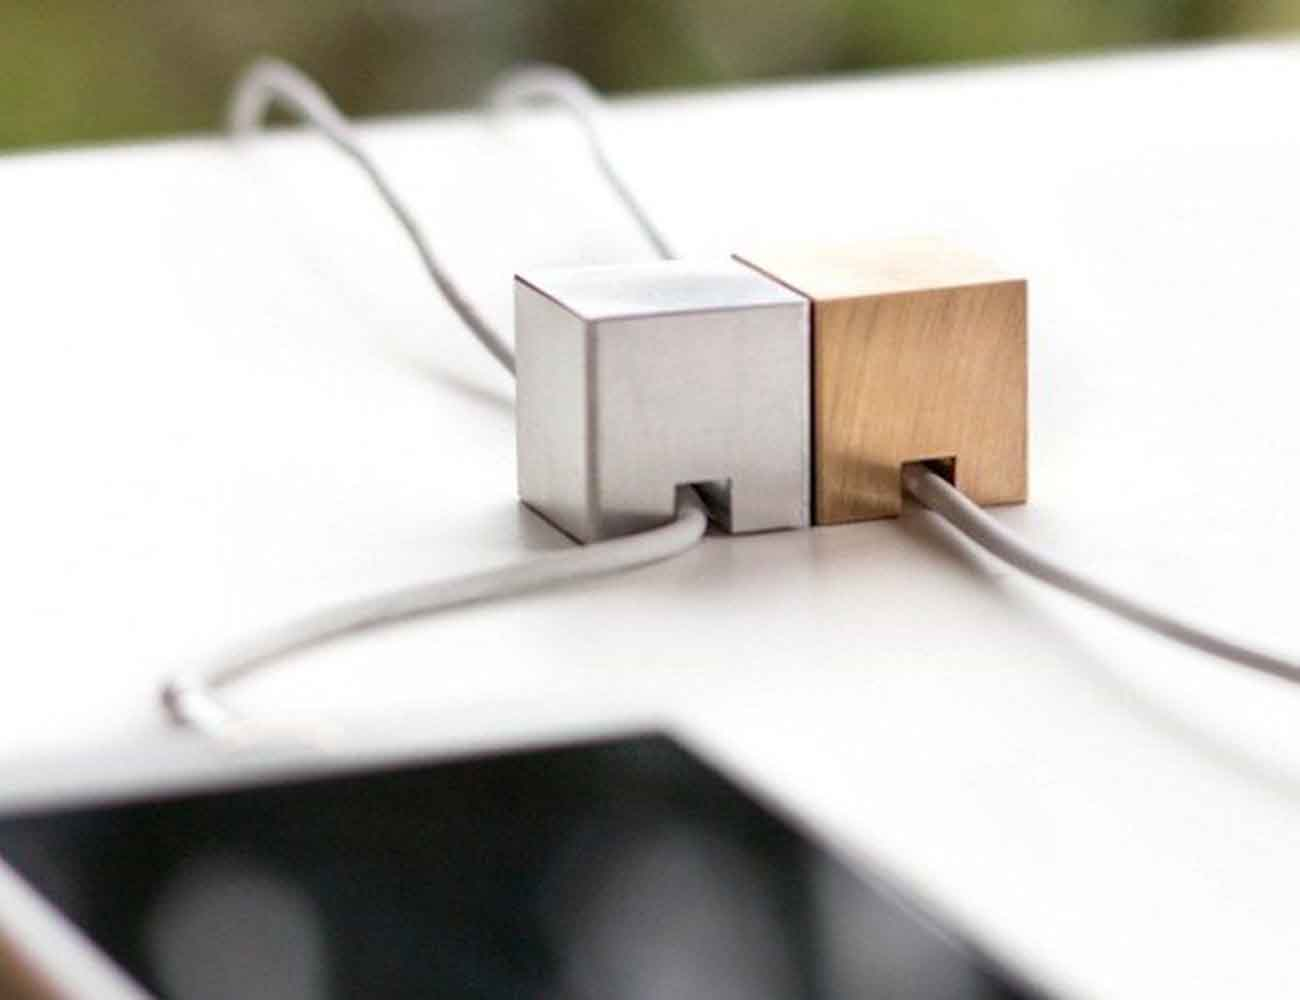 Stacks Metal Cube Desk Accessories Organizer